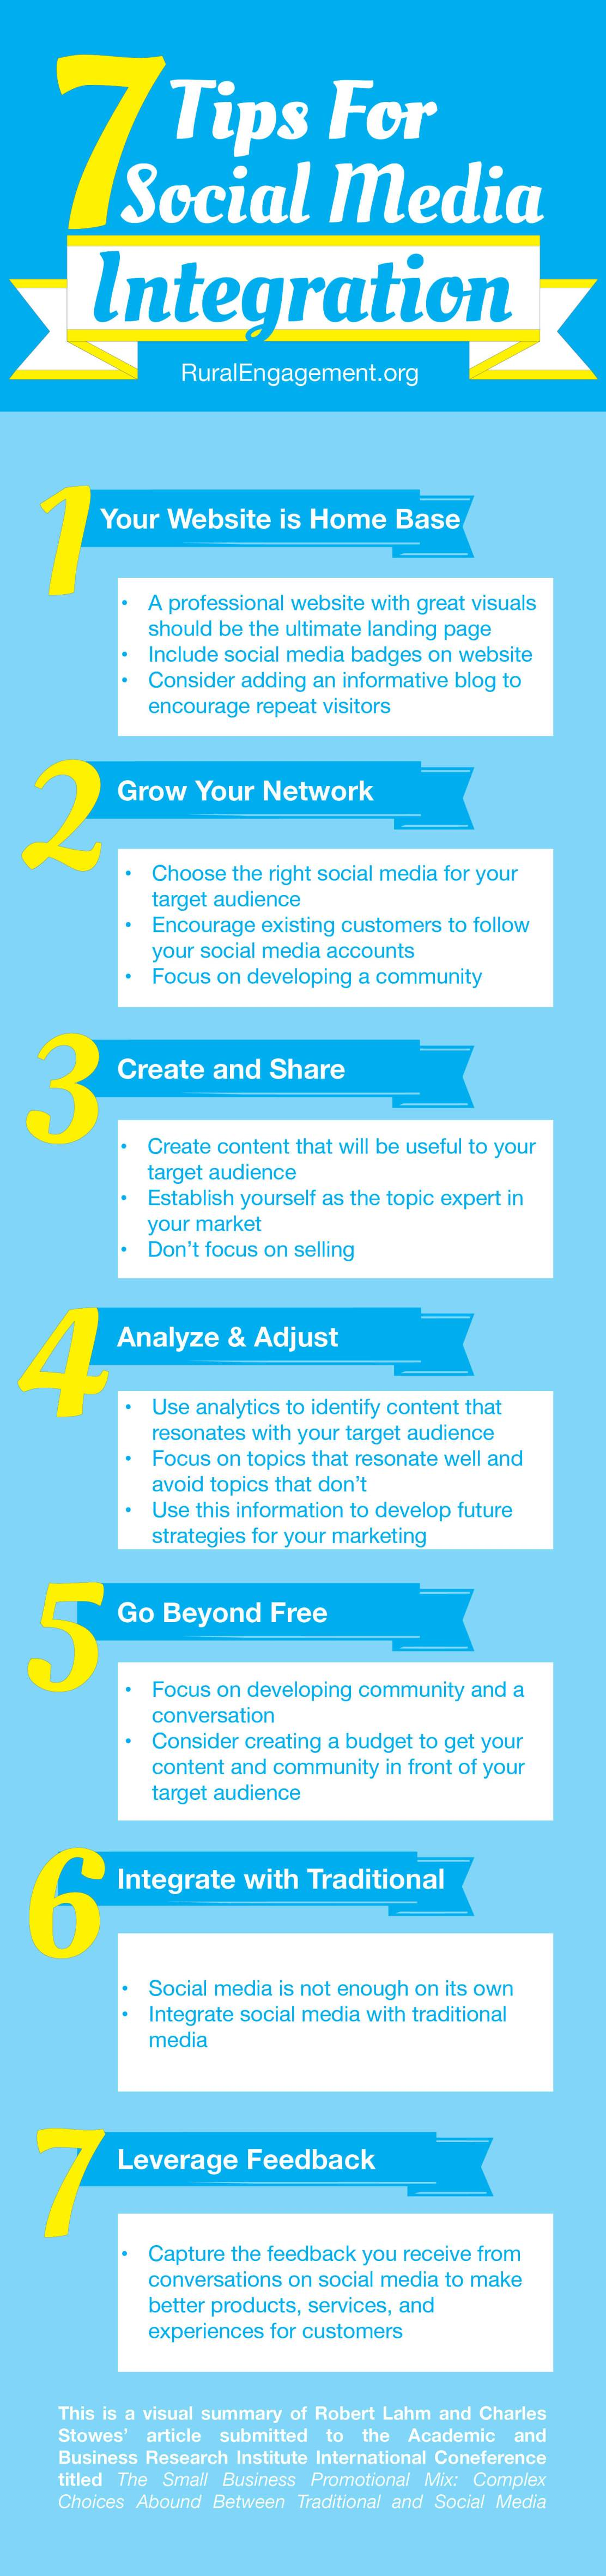 Seven tips for social media integration info graphic